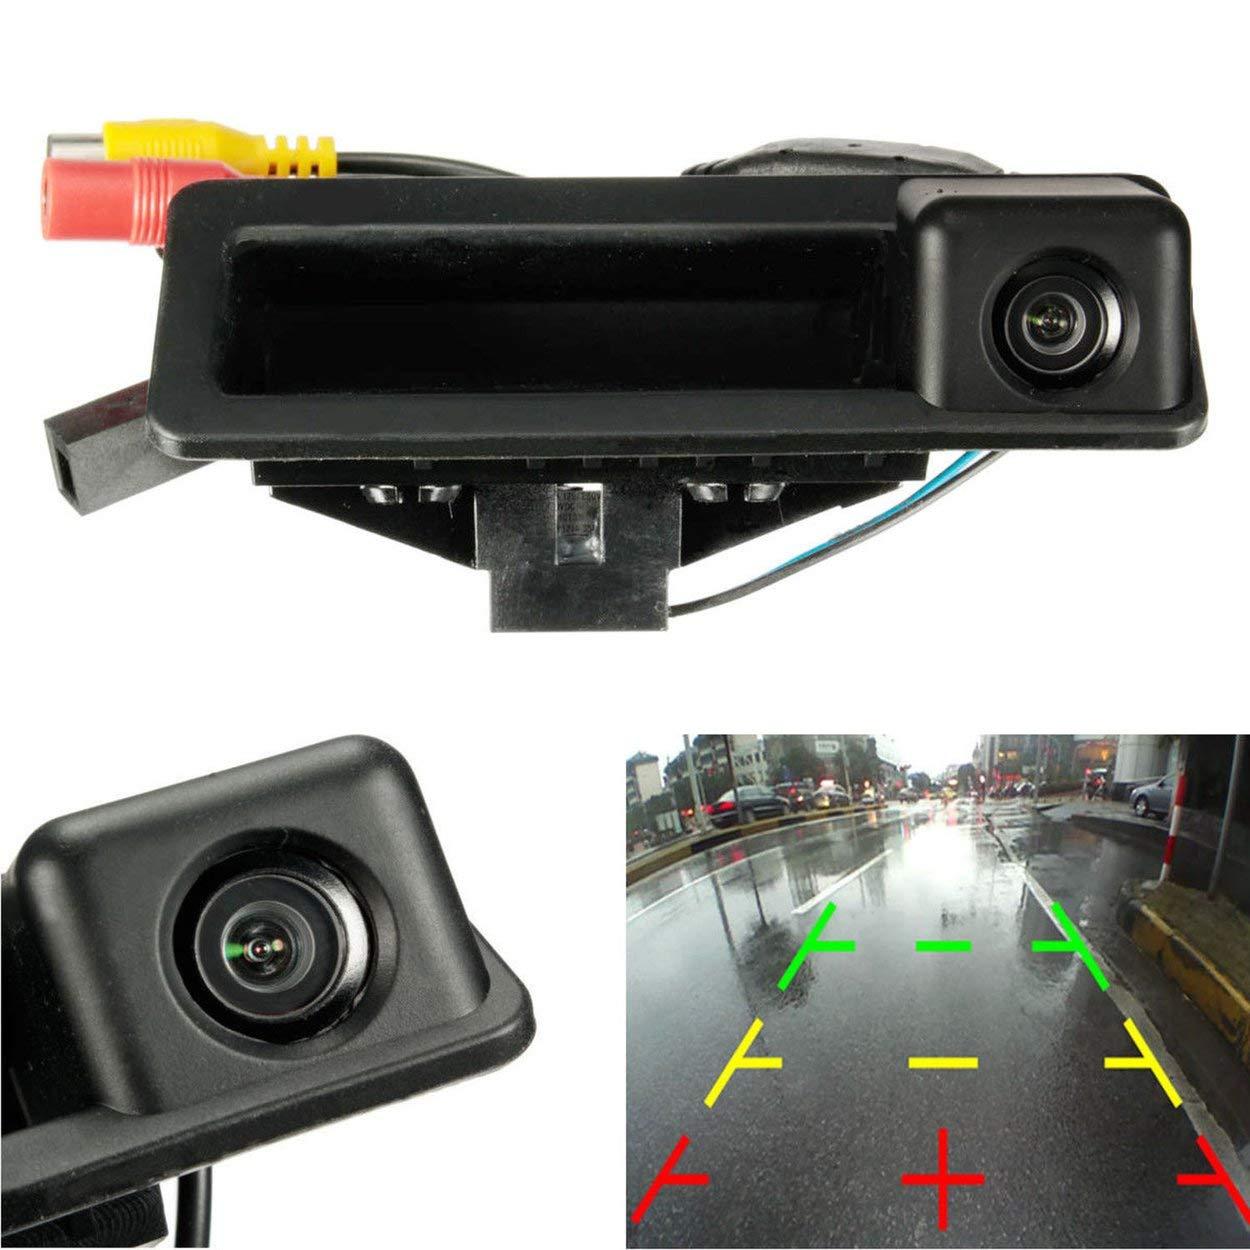 Car Reversing Rear View Camera For Bmw 3/5 Series X5 X1 X6 E39 E46 E53 E82 E88 E84 E90 E91 E92 E93 E60 E61 E70 E71 E72(China)